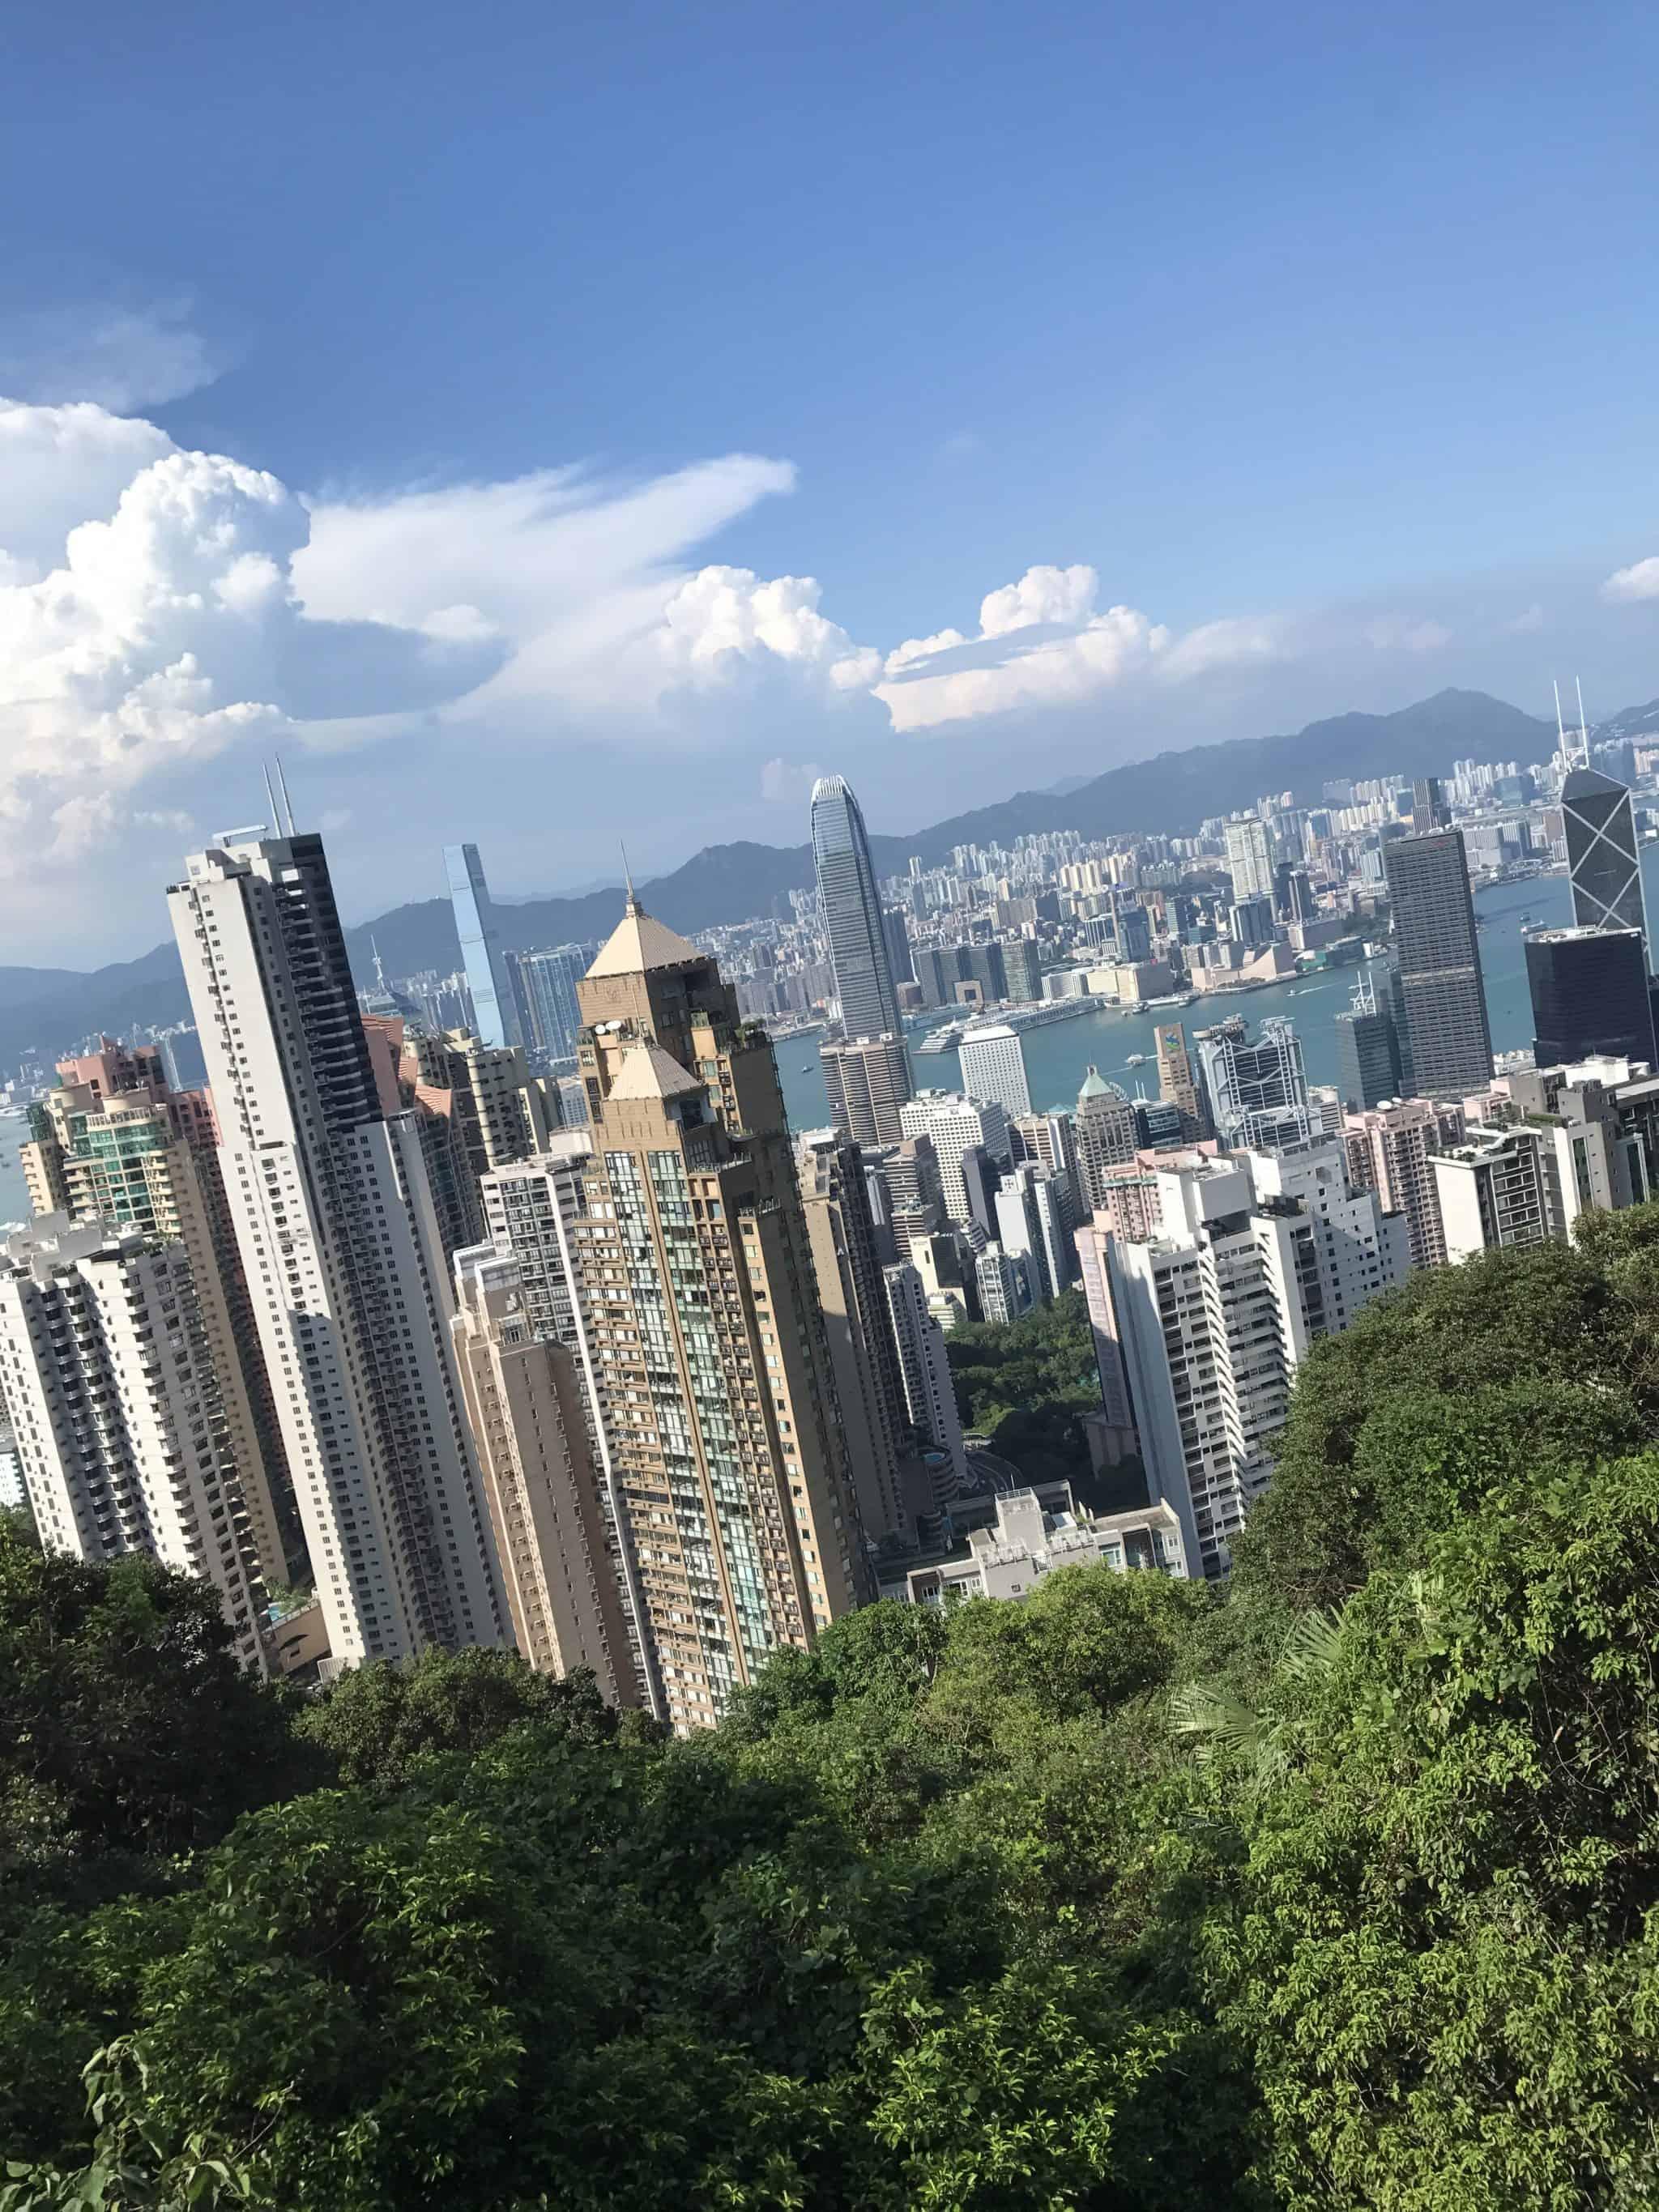 3 days in Hong kong, what to do in Hong Kong, Hong Kong itinerary 3 days, hong kong itinerary, hong kong island, hong kong main land, where to stay in hong kong, Victoria Peak